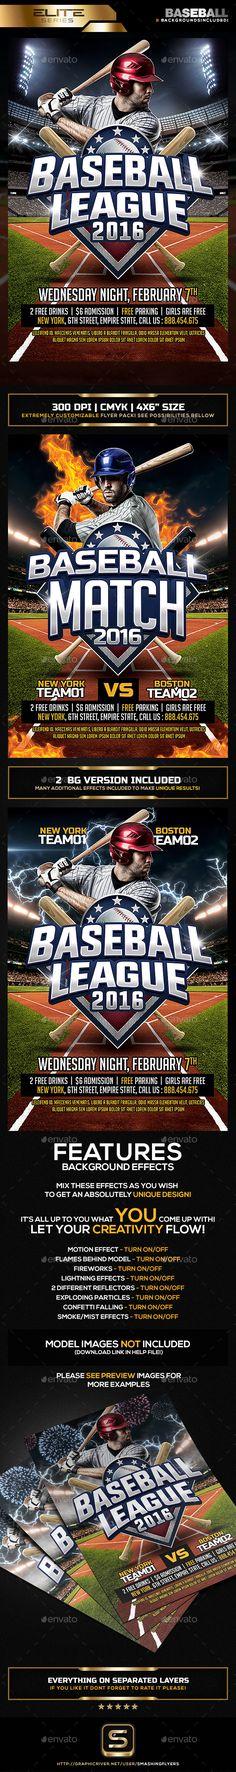 Baseball League Flyer Template PSD. Download here: http://graphicriver.net/item/baseball-league-flyer-template/14686834?ref=ksioks